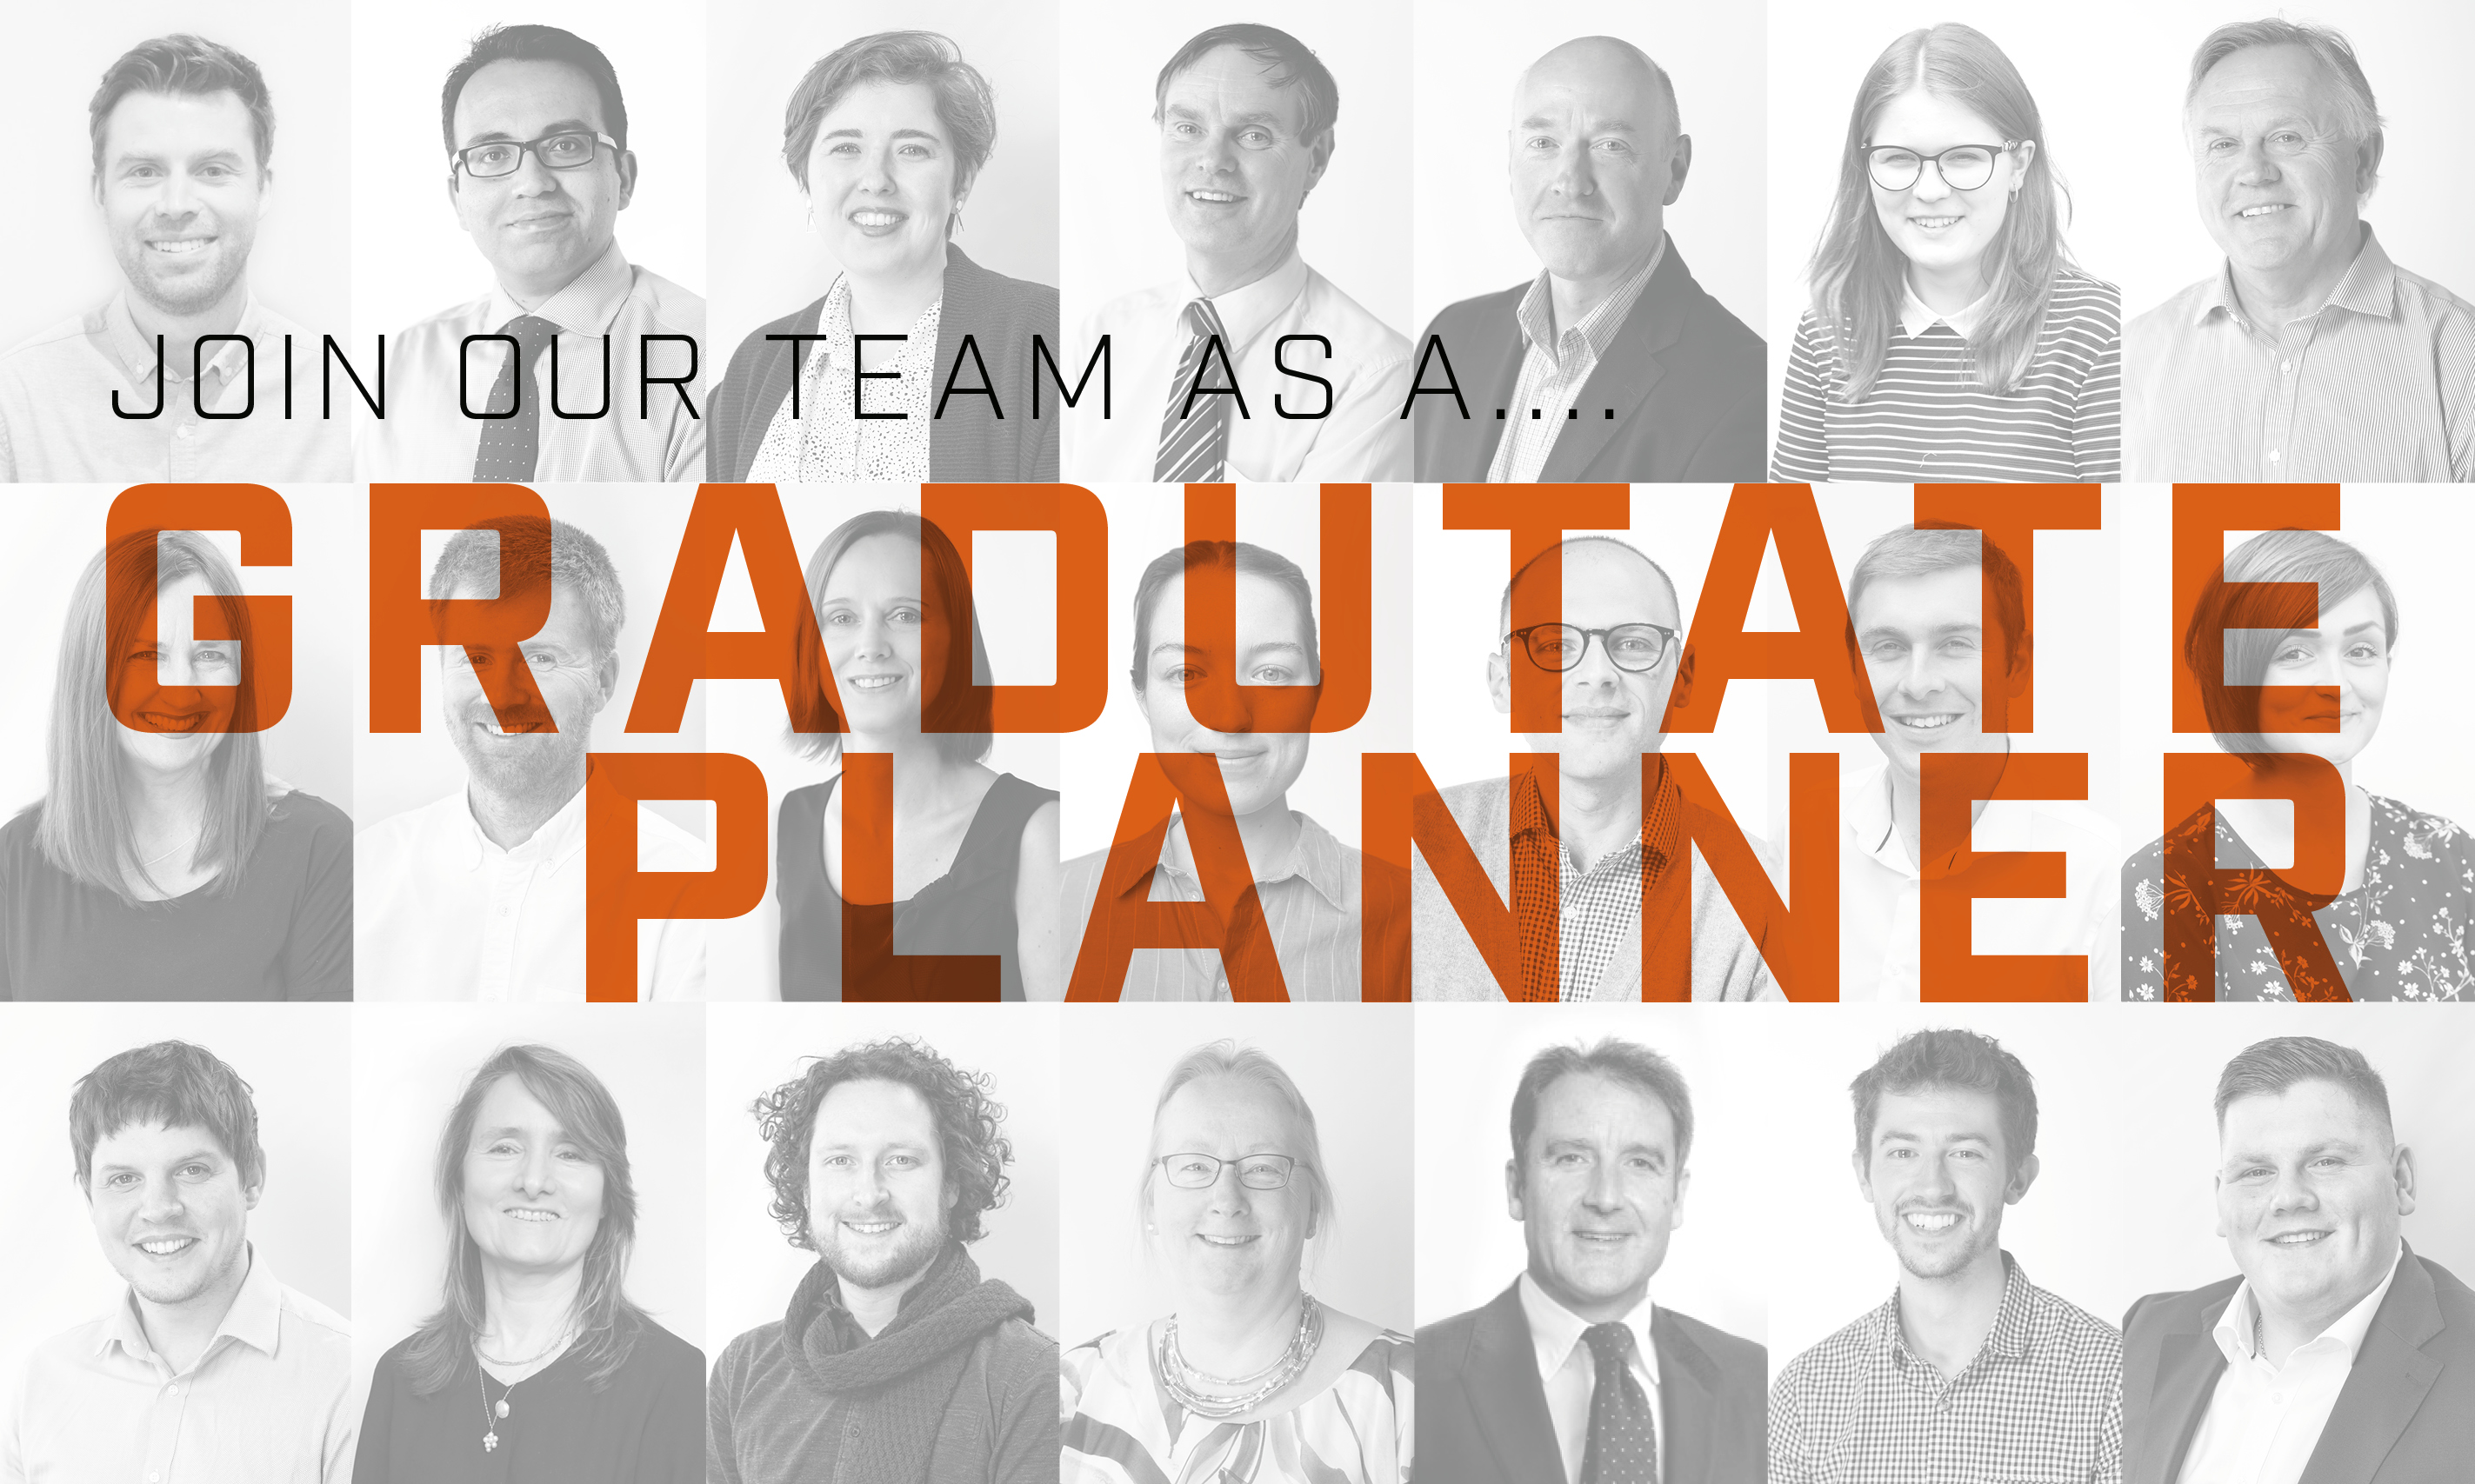 Graduate Planner, Job vacancy, Hiring, job, graduate, planner, town planner, WWA Studios, WWA, West Waddy Archadia, West Waddy, Archadia, Architecture, Urban Design, Town Planning